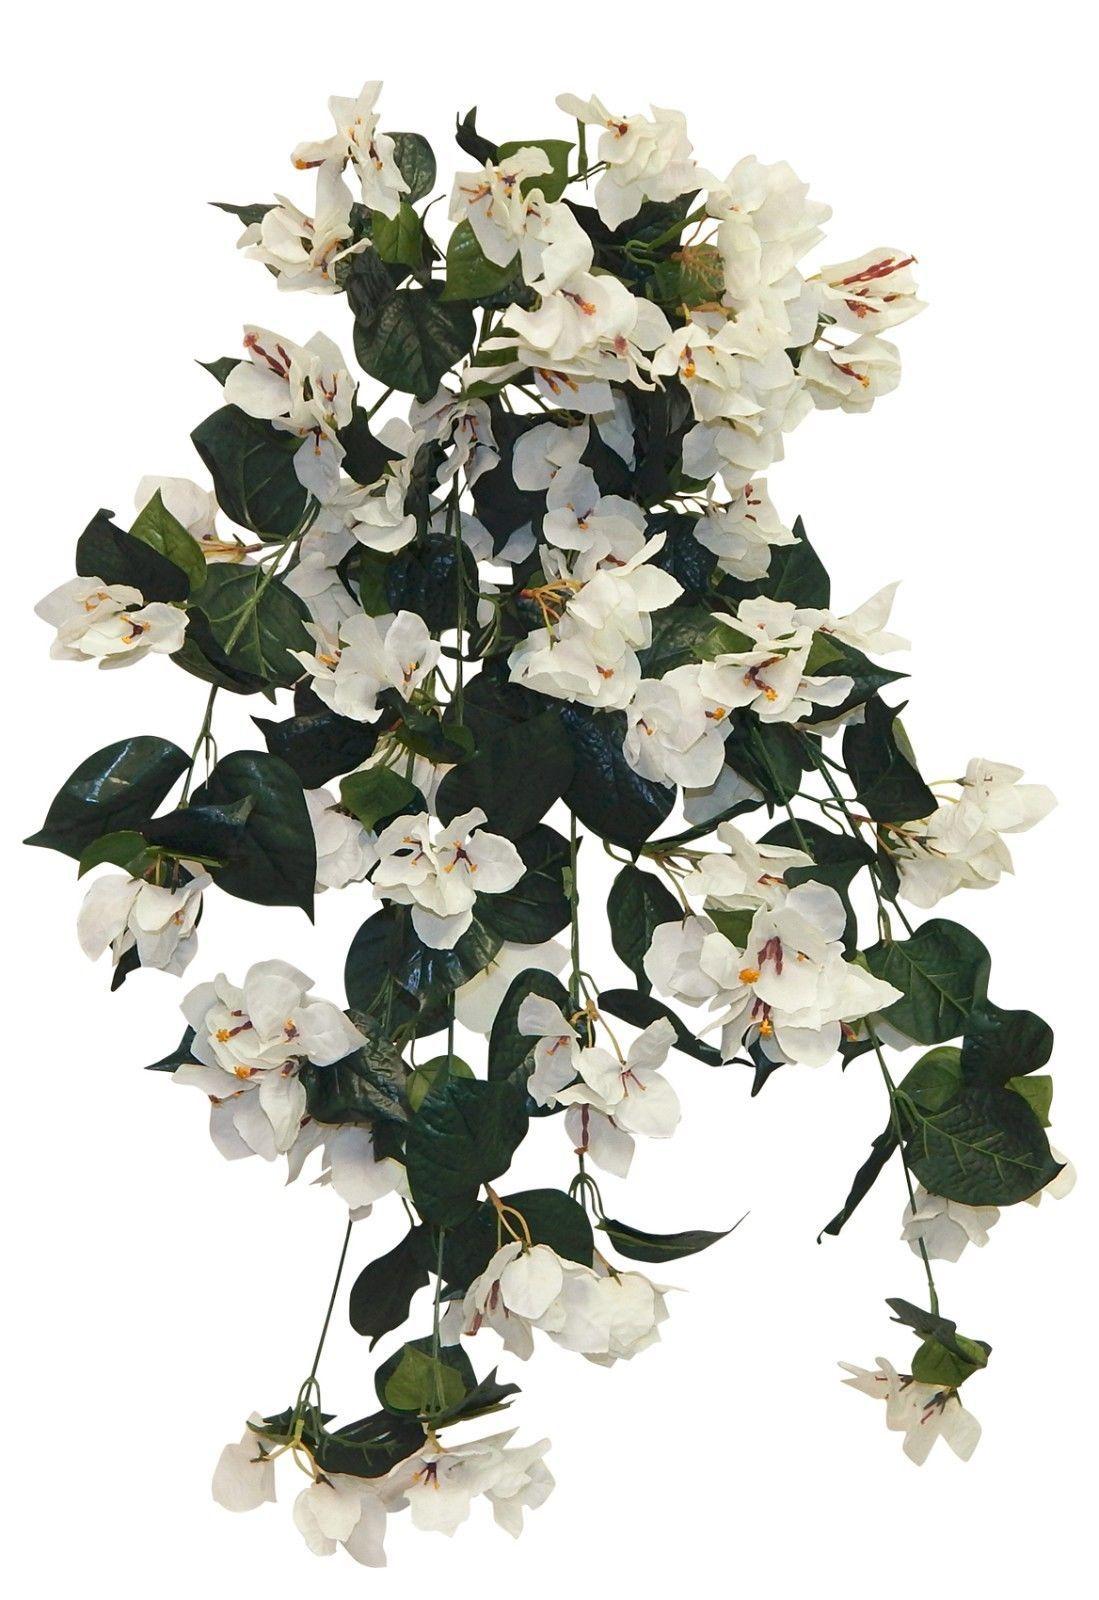 Flowers Petals And Garlands 20938 34 Cream Bougainvillea Hanging Bush Silk Flowers We Silk Flowers Wedding Artificial Wedding Bouquets Arch Decoration Wedding